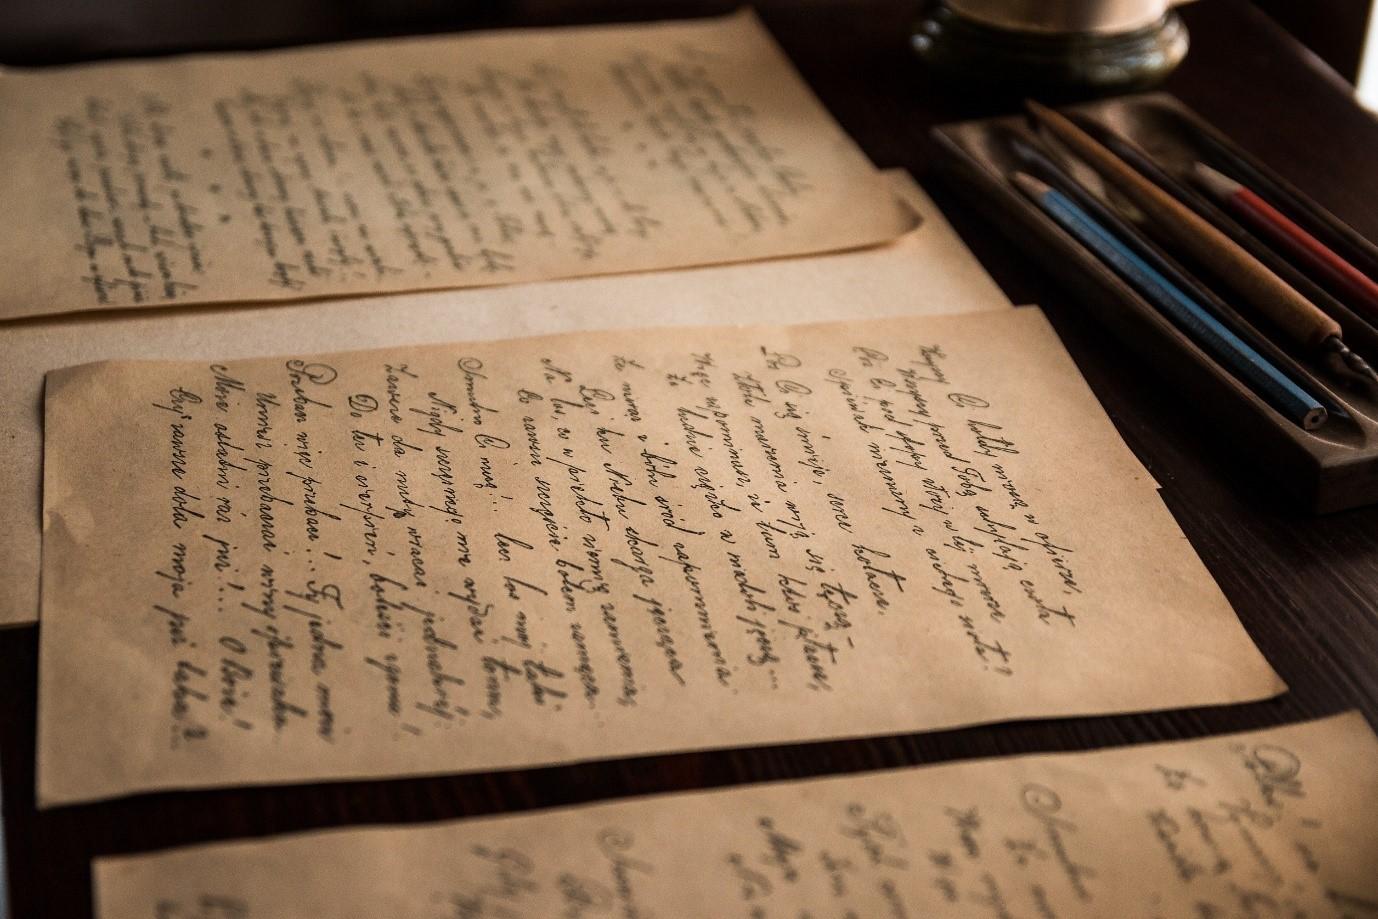 archive-handwriting-handwritten-51343 compressed.jpg